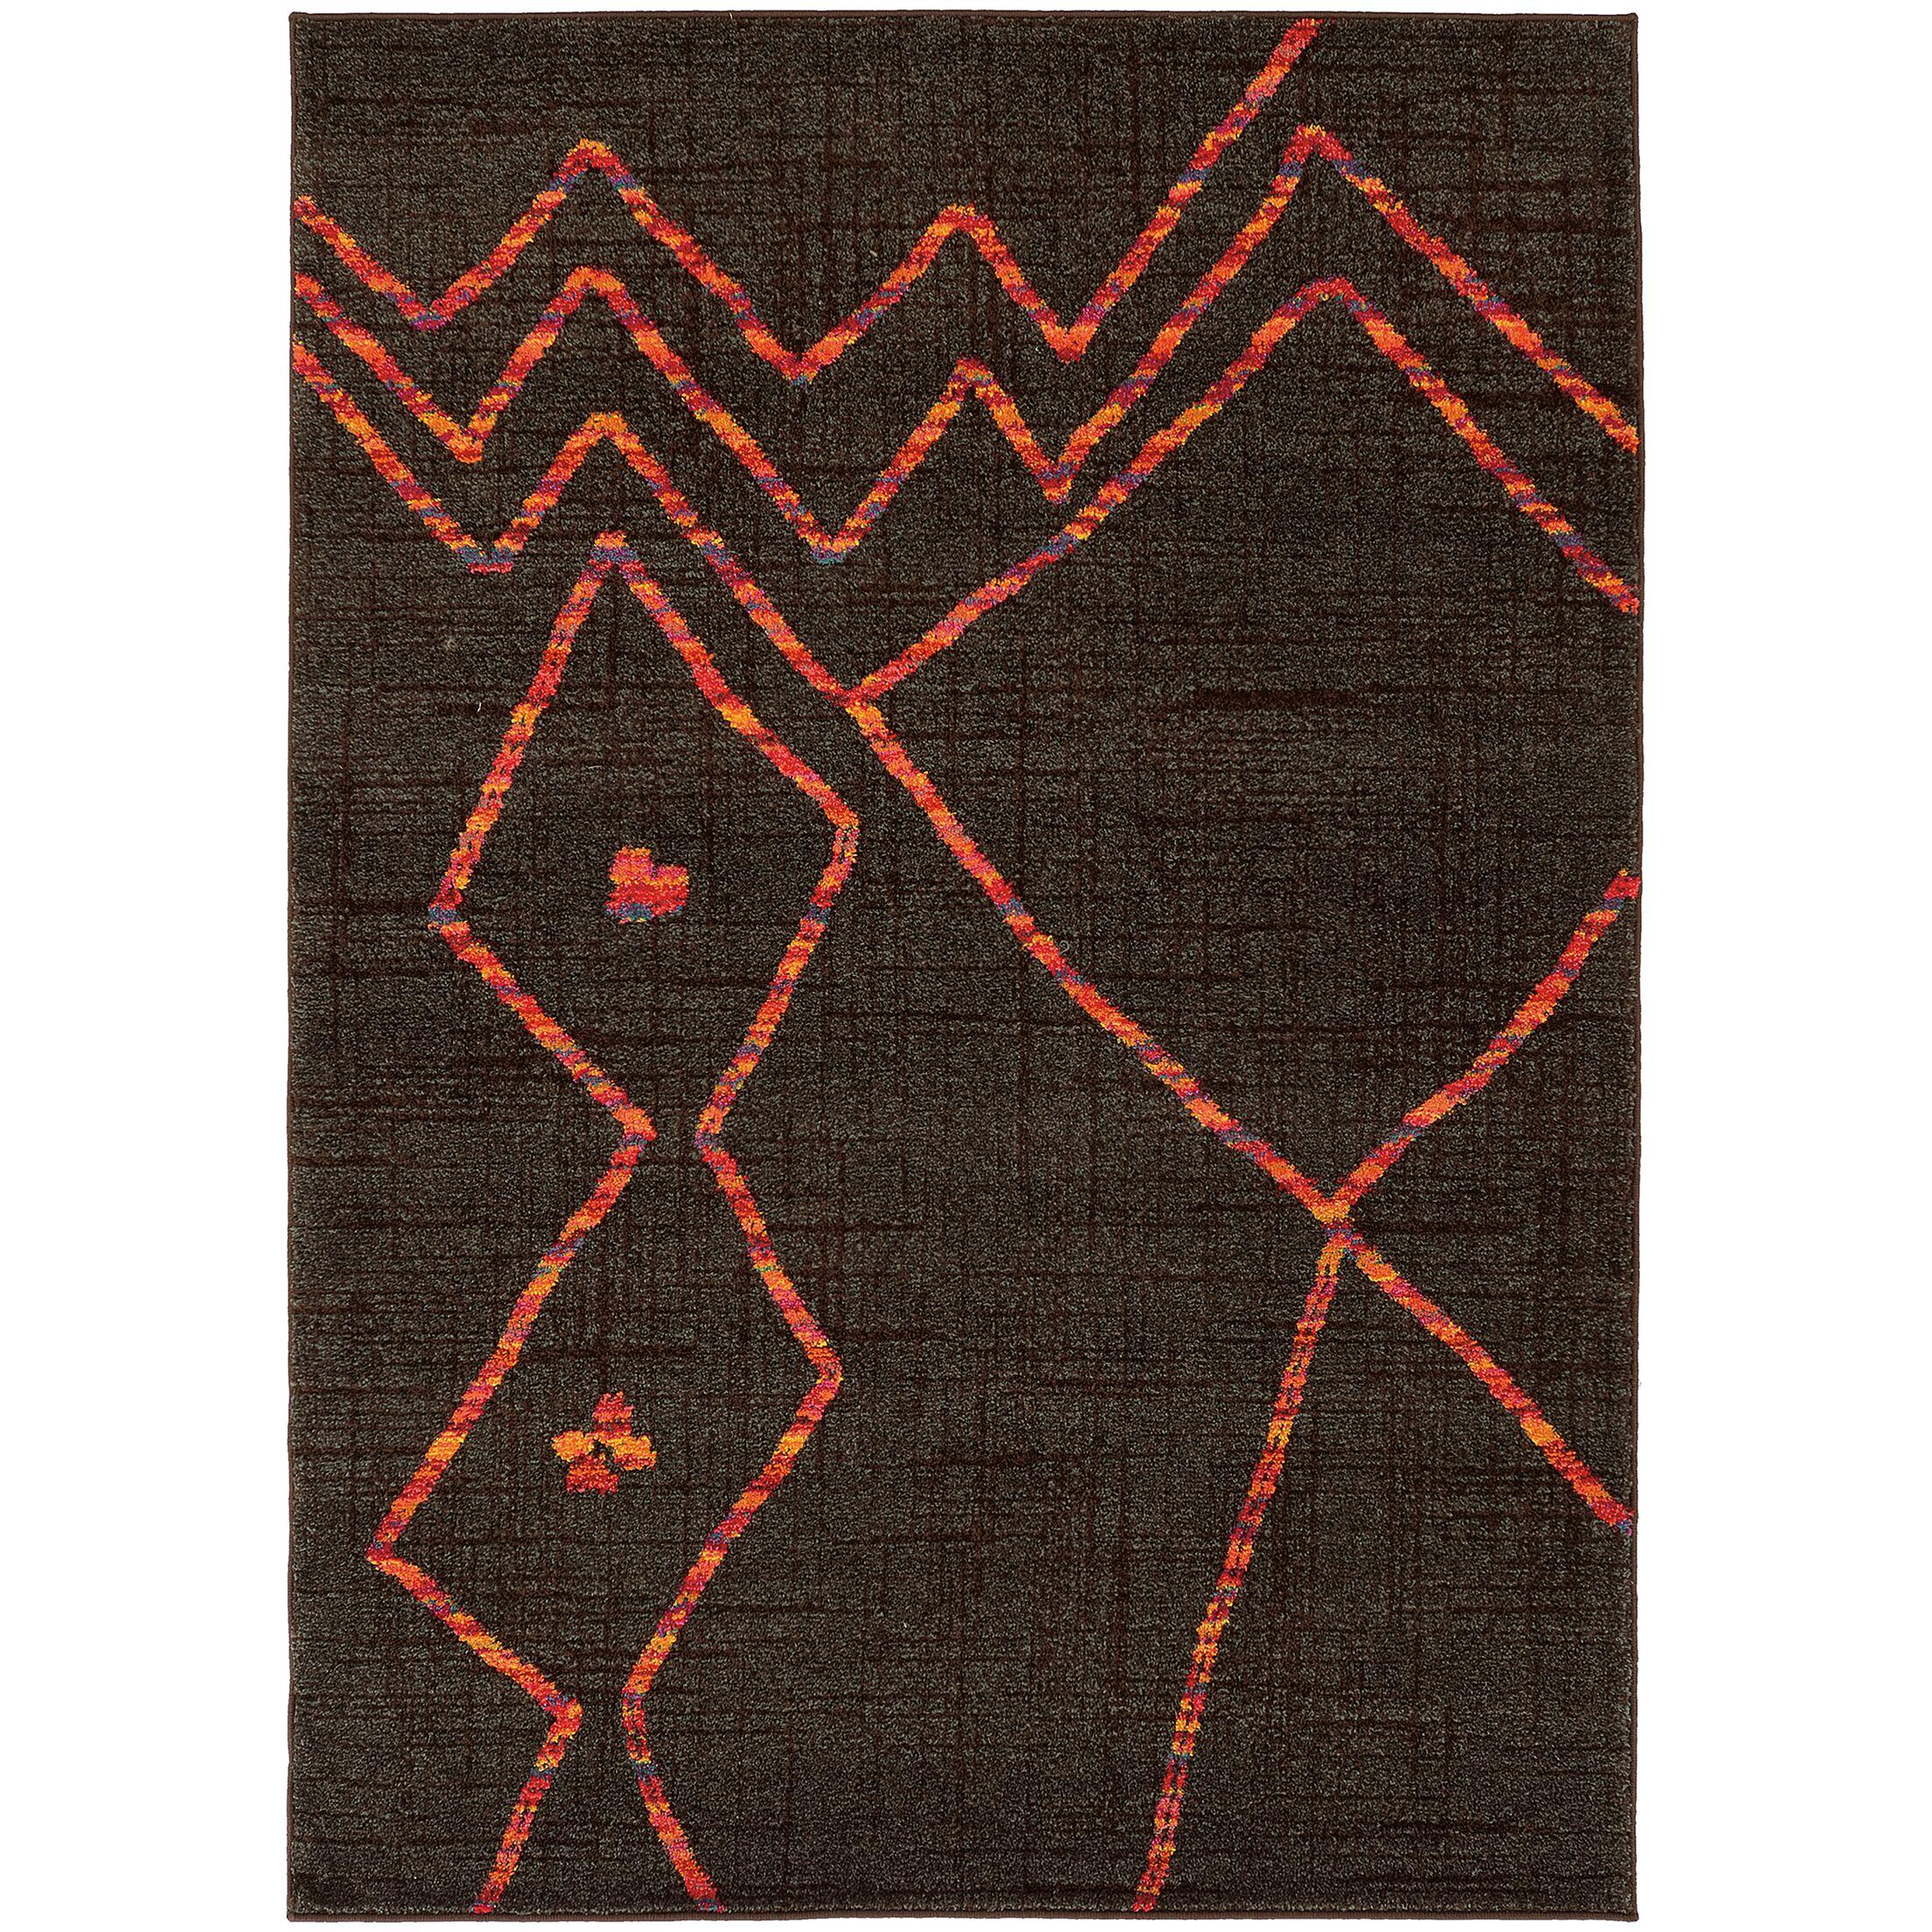 Marquis Brown/Orange Area Rug Rug Size: Rectangle 9'9